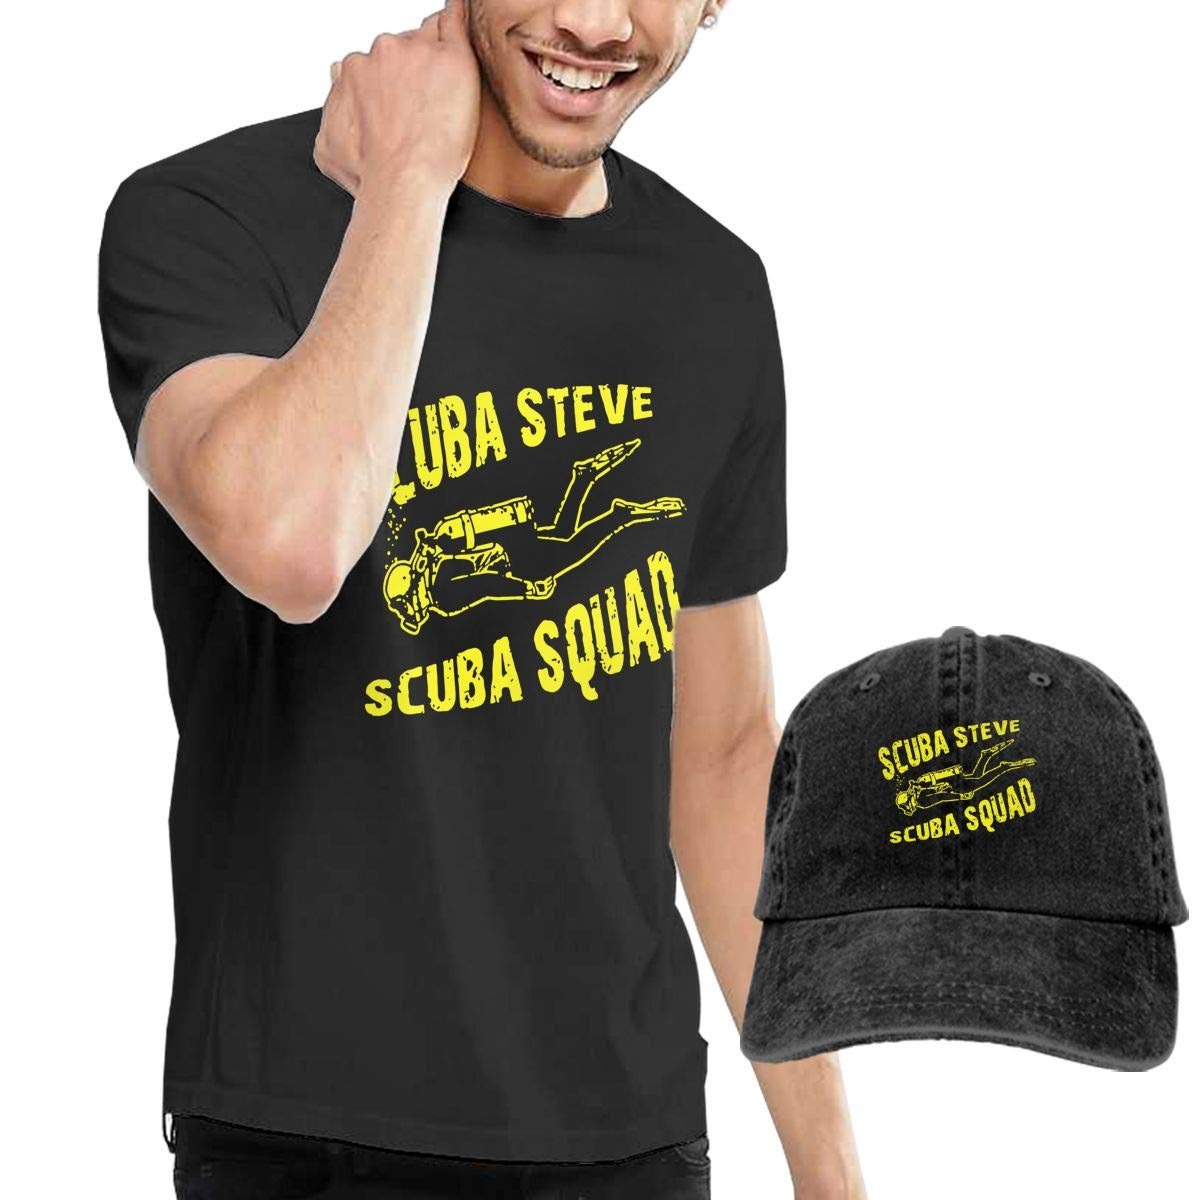 WWTBBJ-B Scuba Steve Scuba Squad Adult Mens Sportstyle T Shirts and Sport Jean Headgear